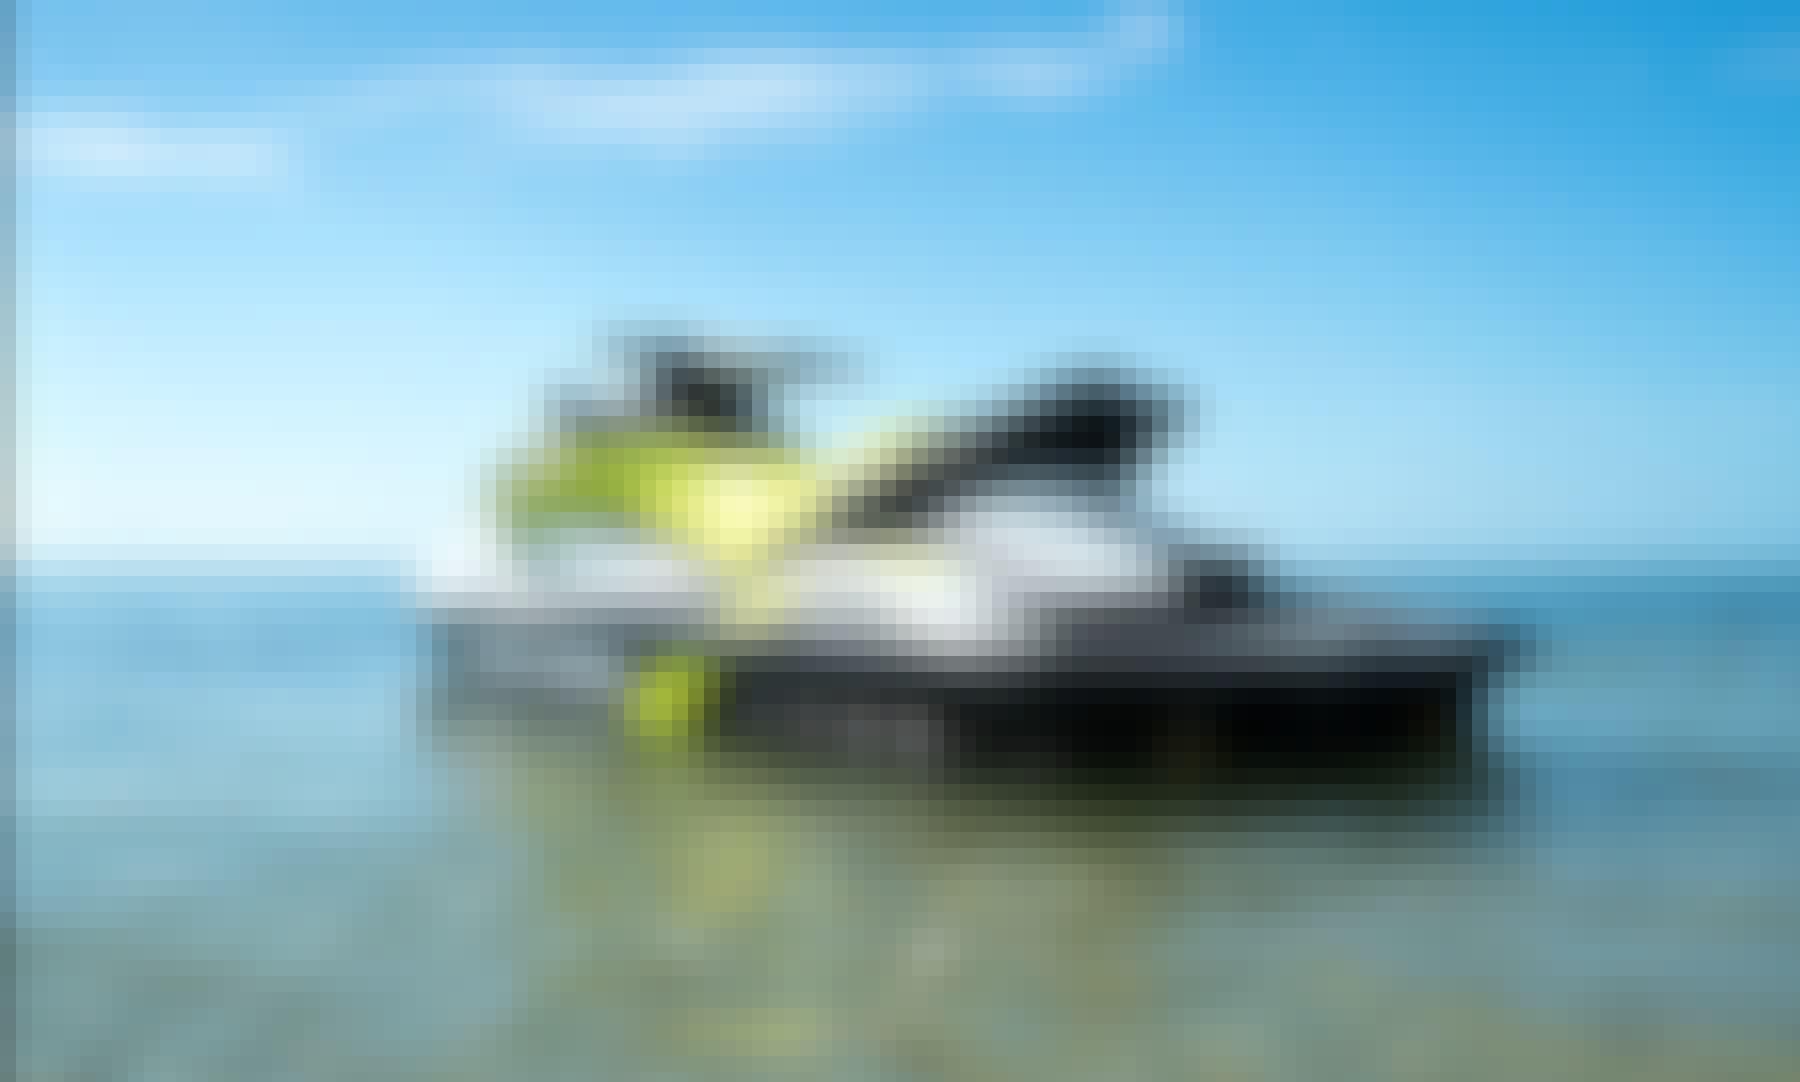 SeaDoo GTI Jetski Rental - Cruise the Bay of St. Petersburg, Florida